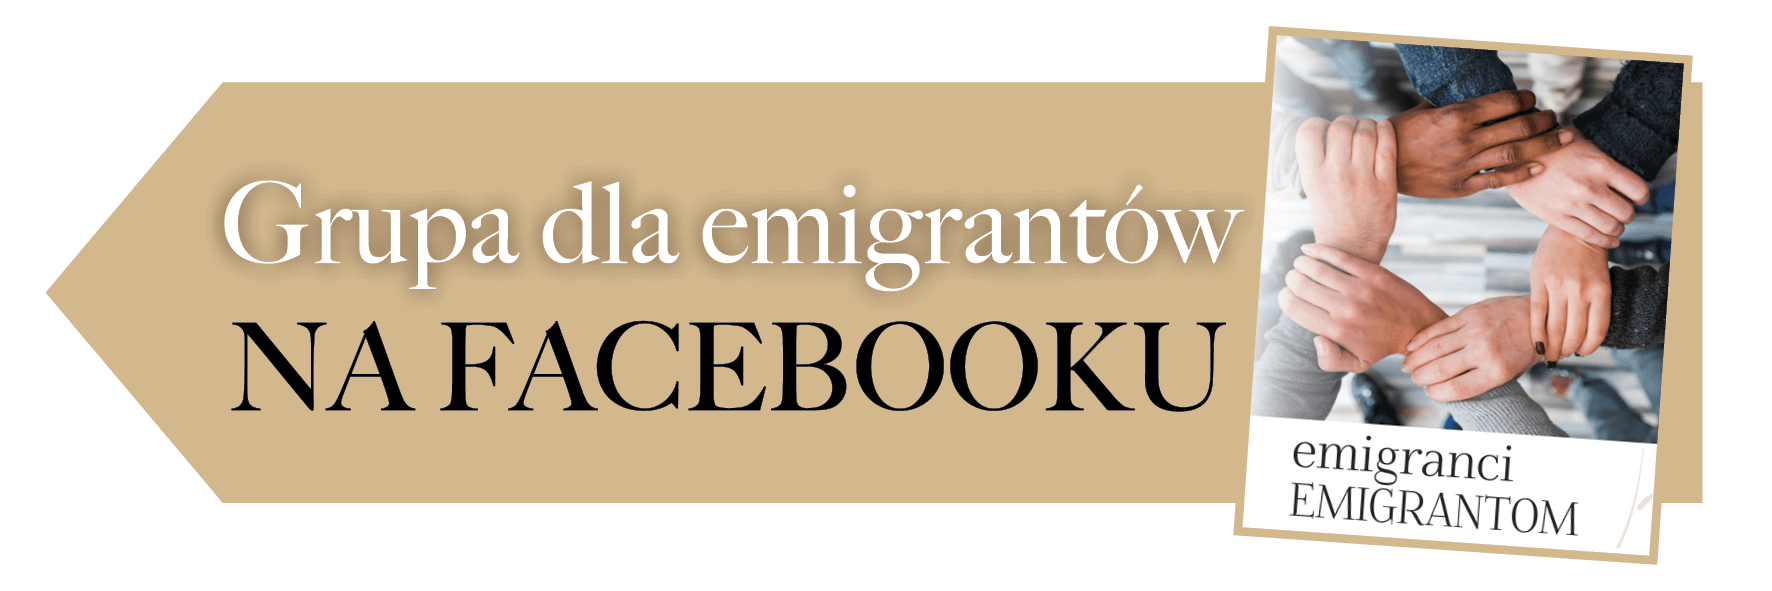 Baner grupa na facebooku Emigranci Emigrantom